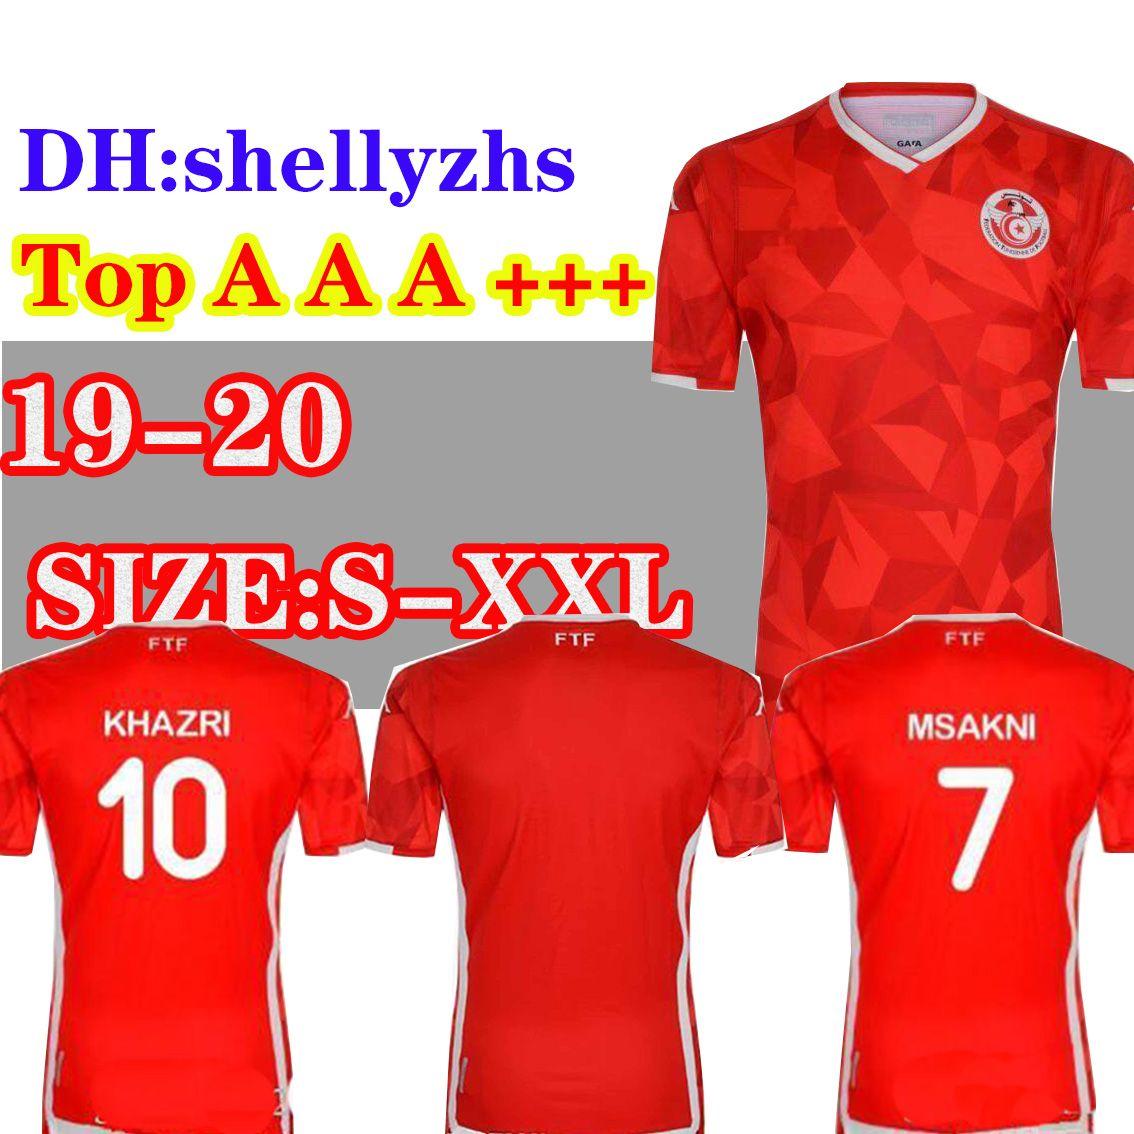 db77cf3bd 2019 Size S XXL 2019 Tunisia National Team Soccer Jerseys 19 20 Msakni  Khazri Sliti Wahbi Khaoui FAKHREDDINE BEN YOUSSE HAMZA Football Shirt From  Shellyzhs